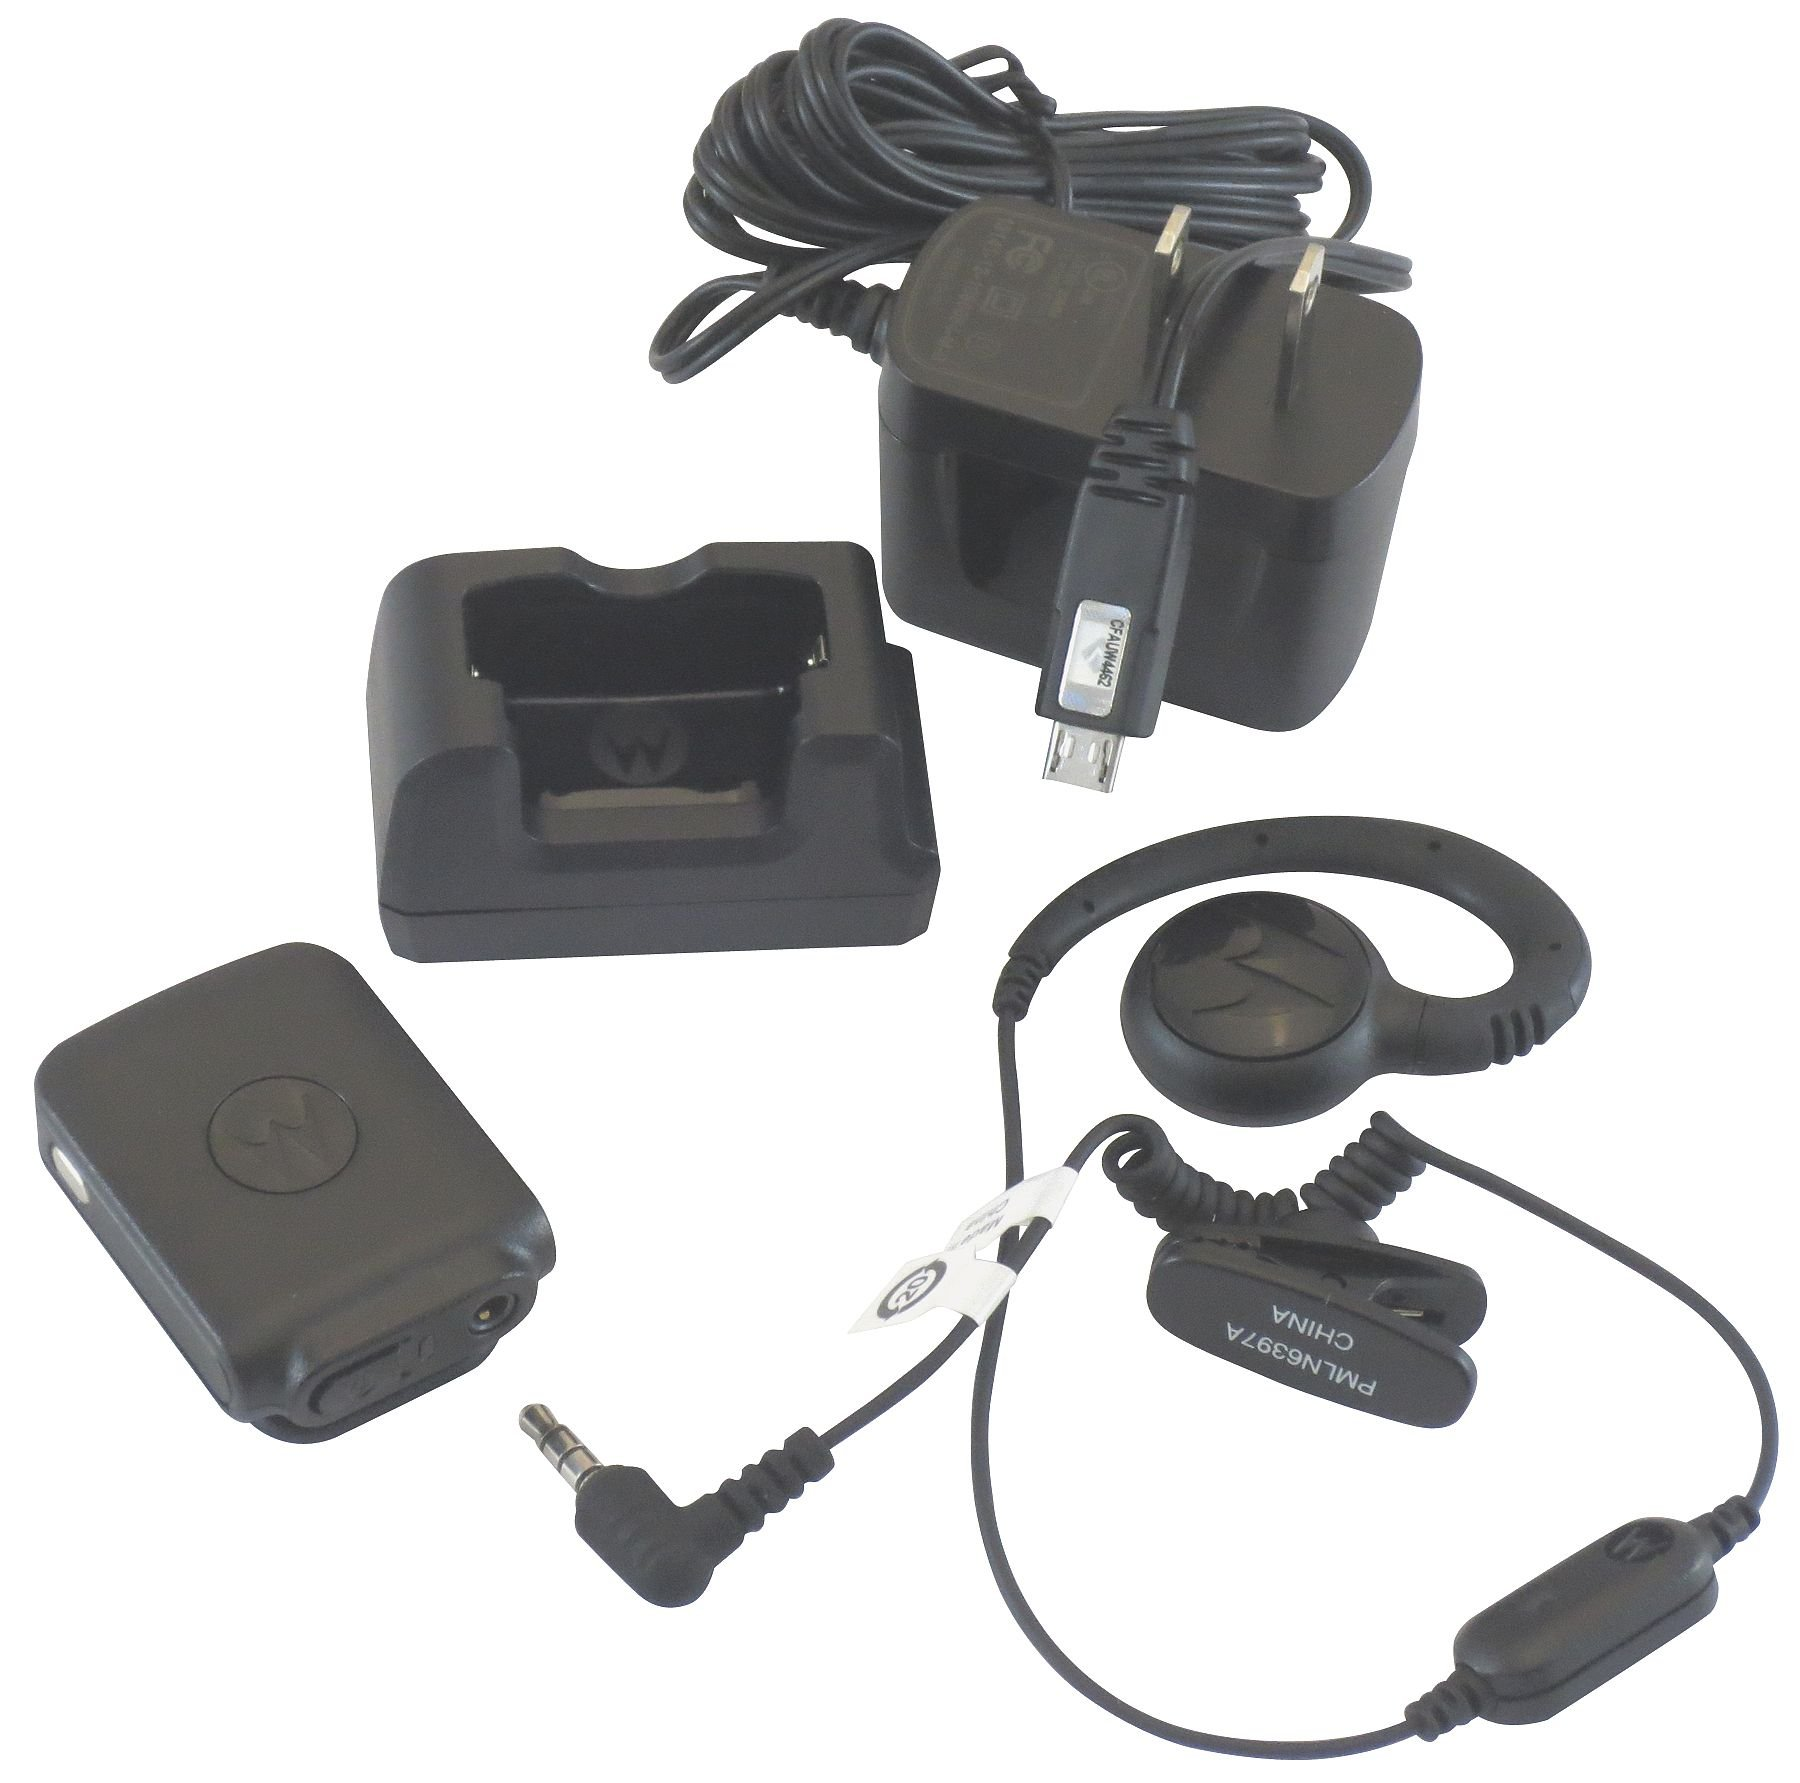 Wireless Bluetooth Accessory Kit